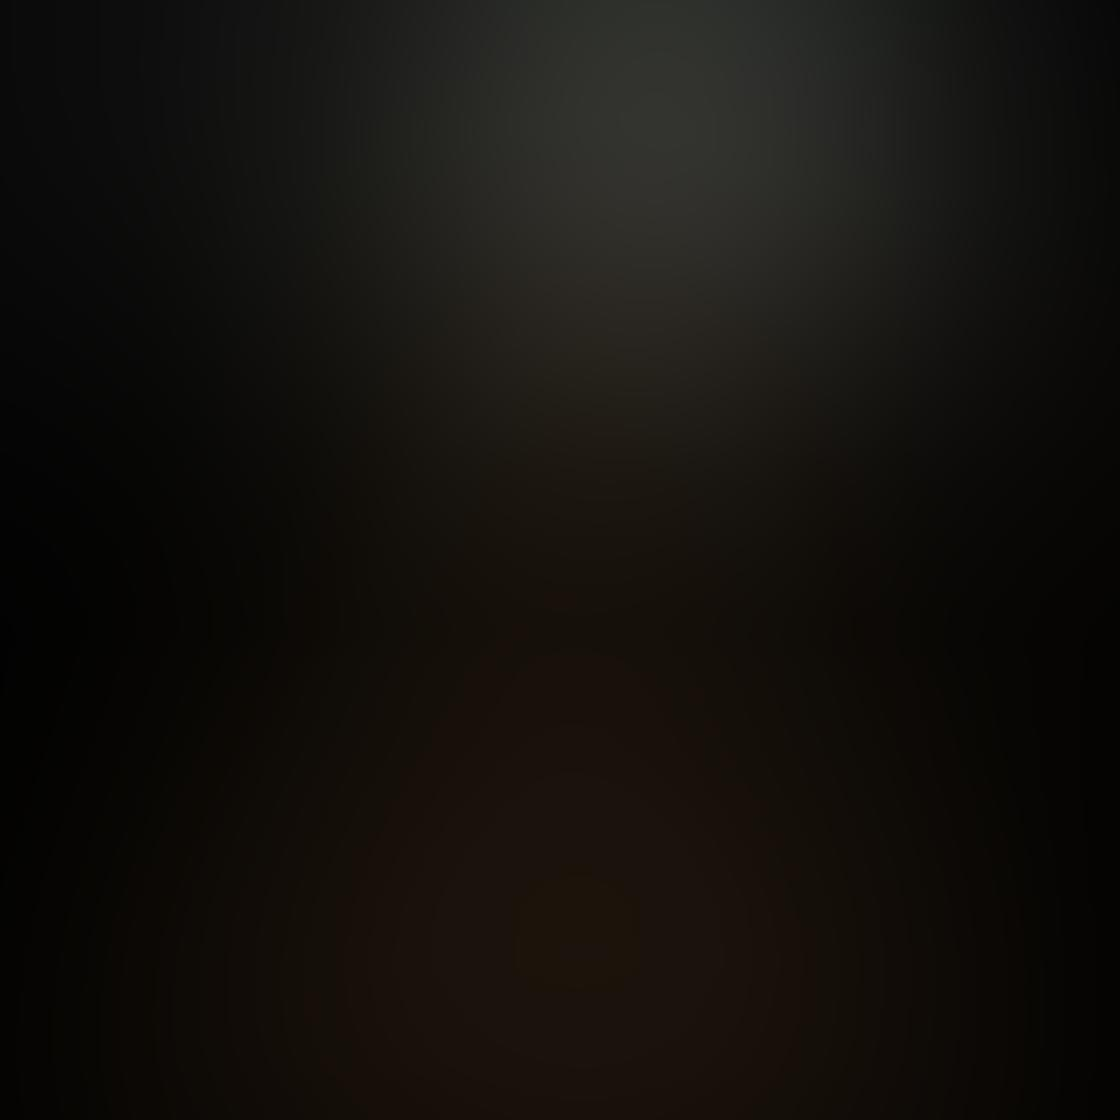 iPhone Photos Low Angle 6